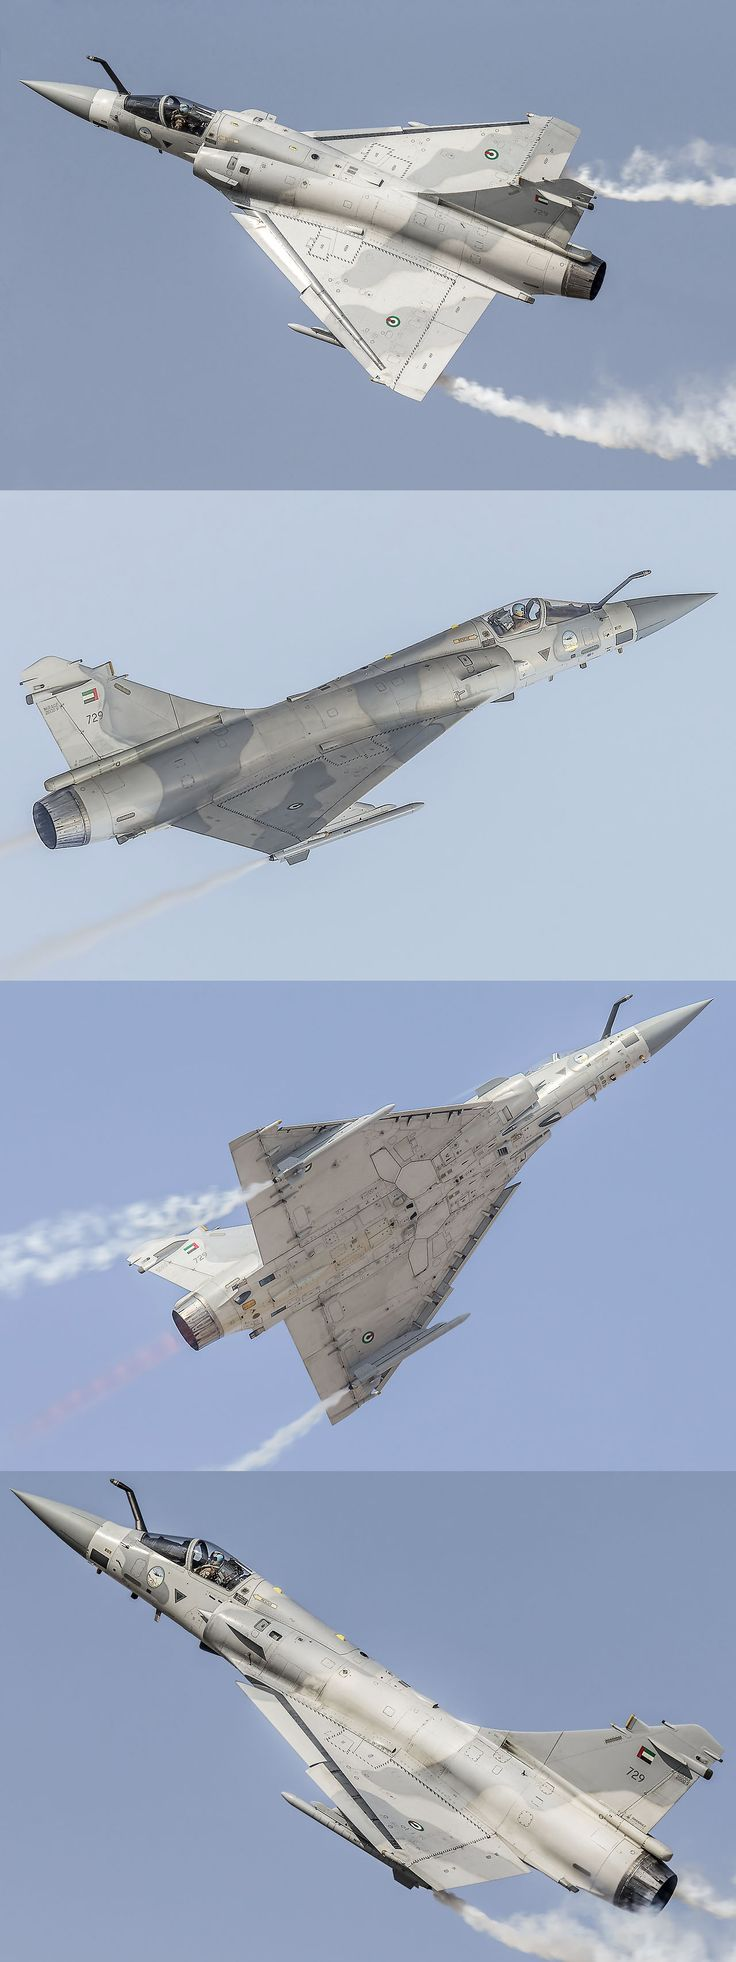 UAE Air Force Dassault Mirage 2000C